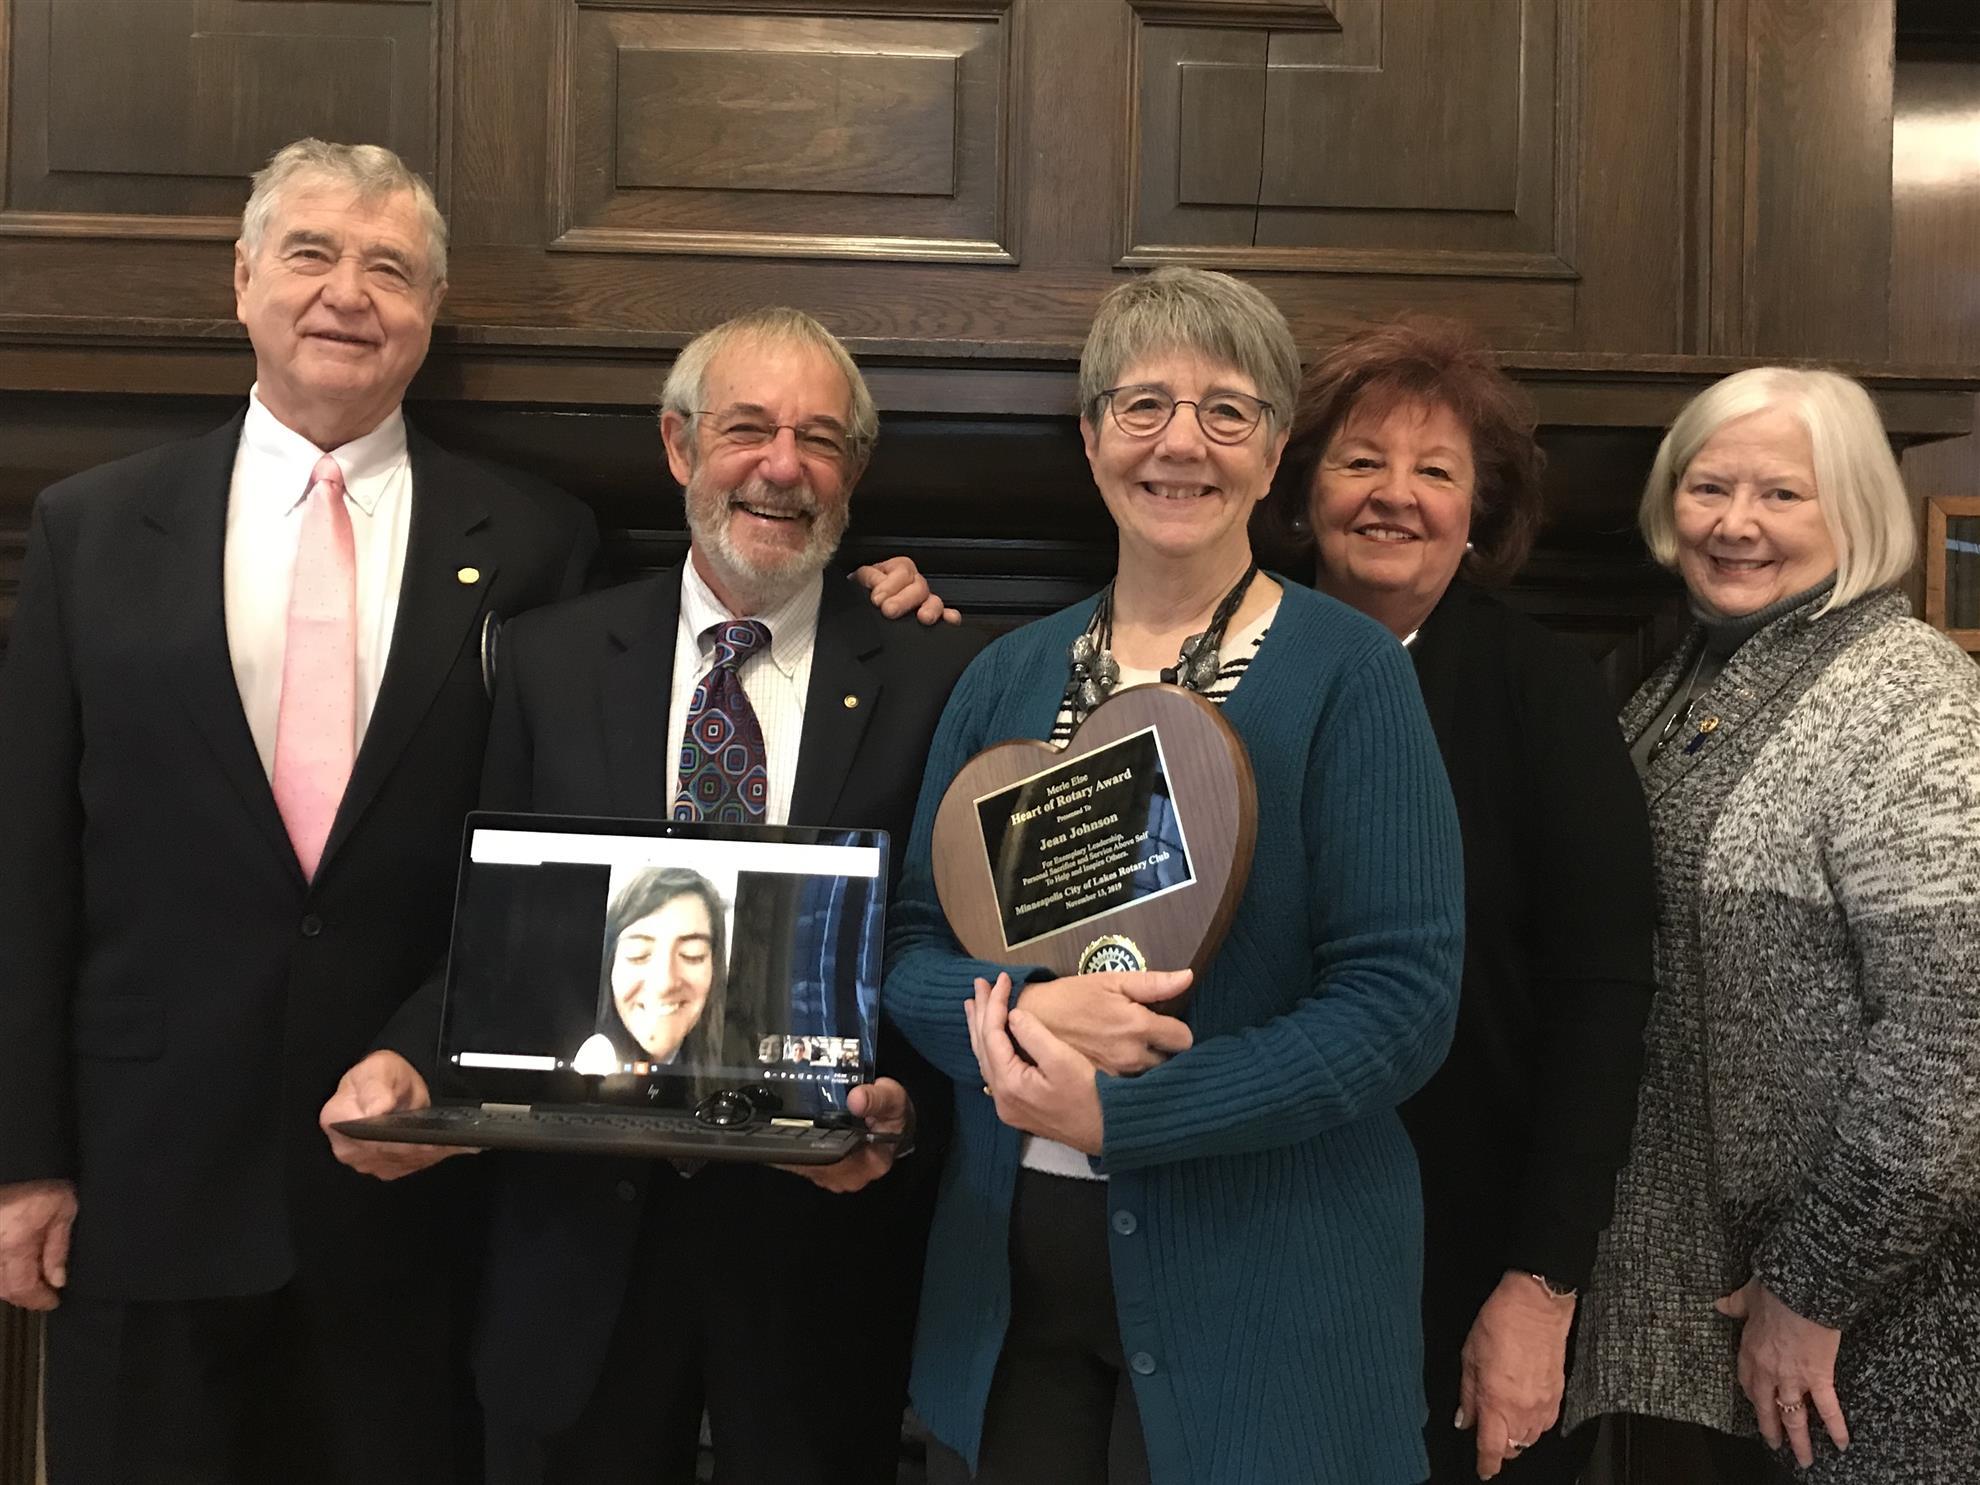 Jean Johnson wins the Merle Else Heart of Rotary Award